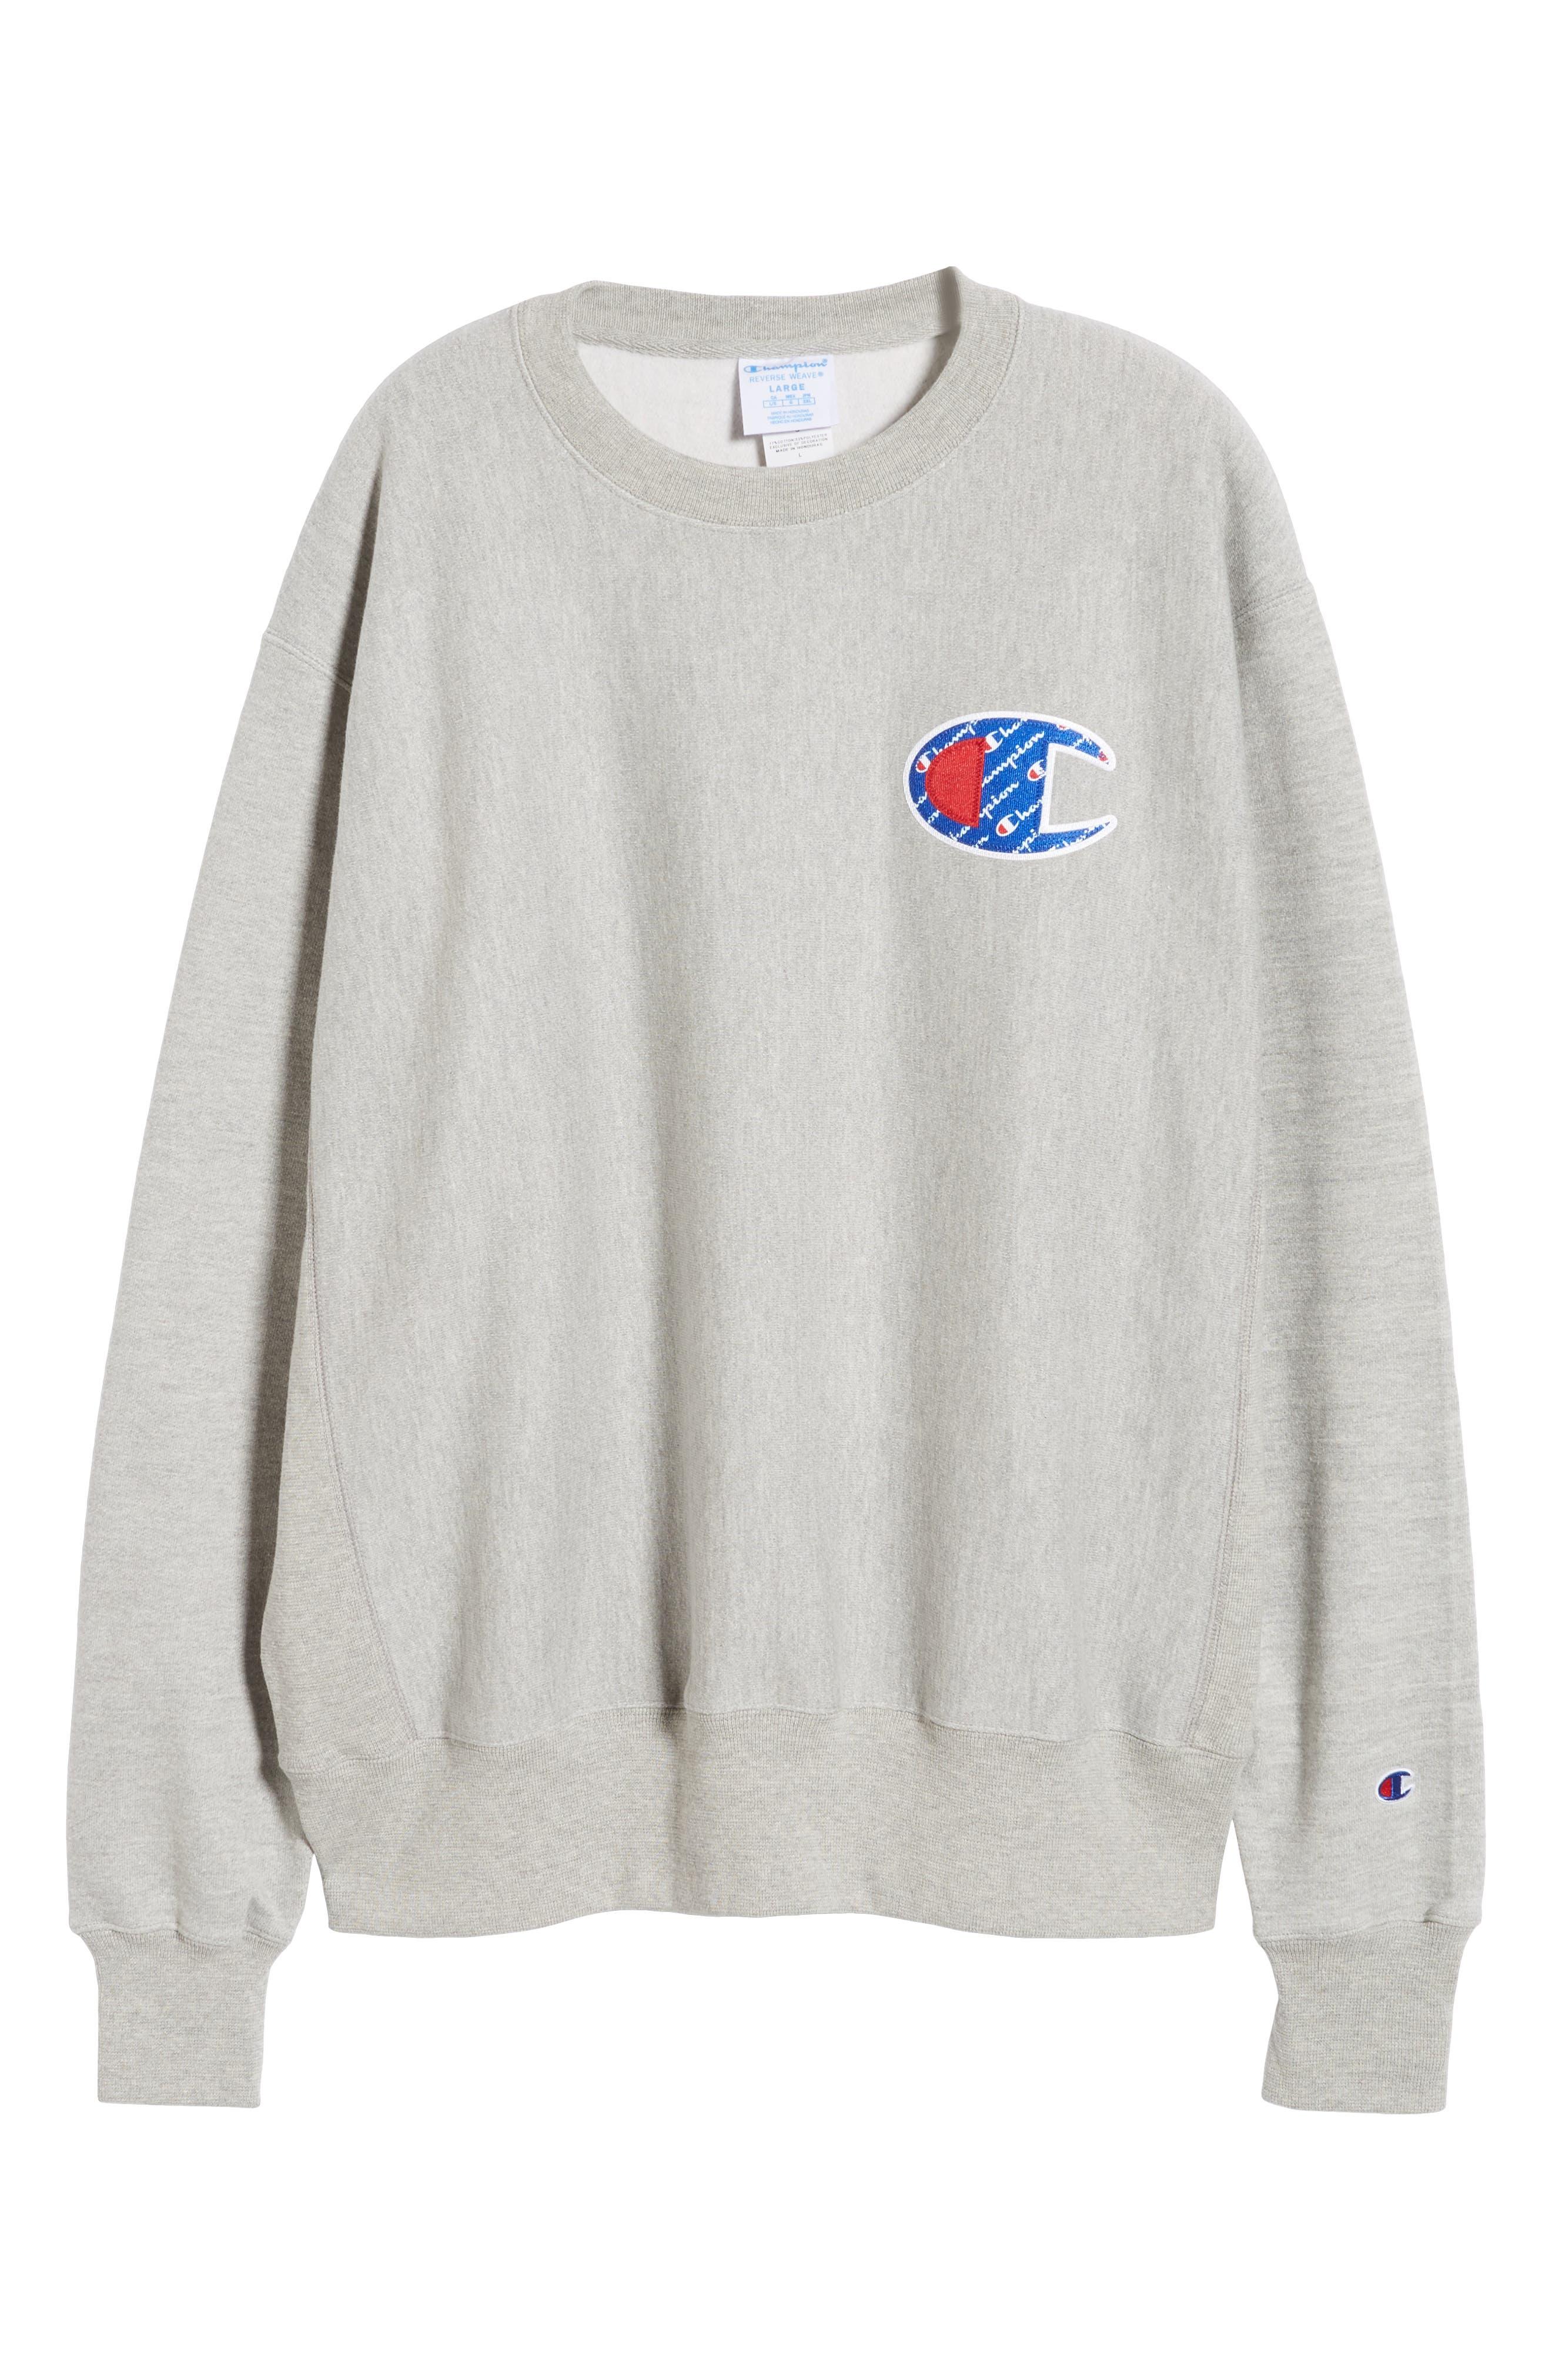 CHAMPION, Sublimated Logo Crewneck Sweatshirt, Alternate thumbnail 4, color, OXFORD GREY